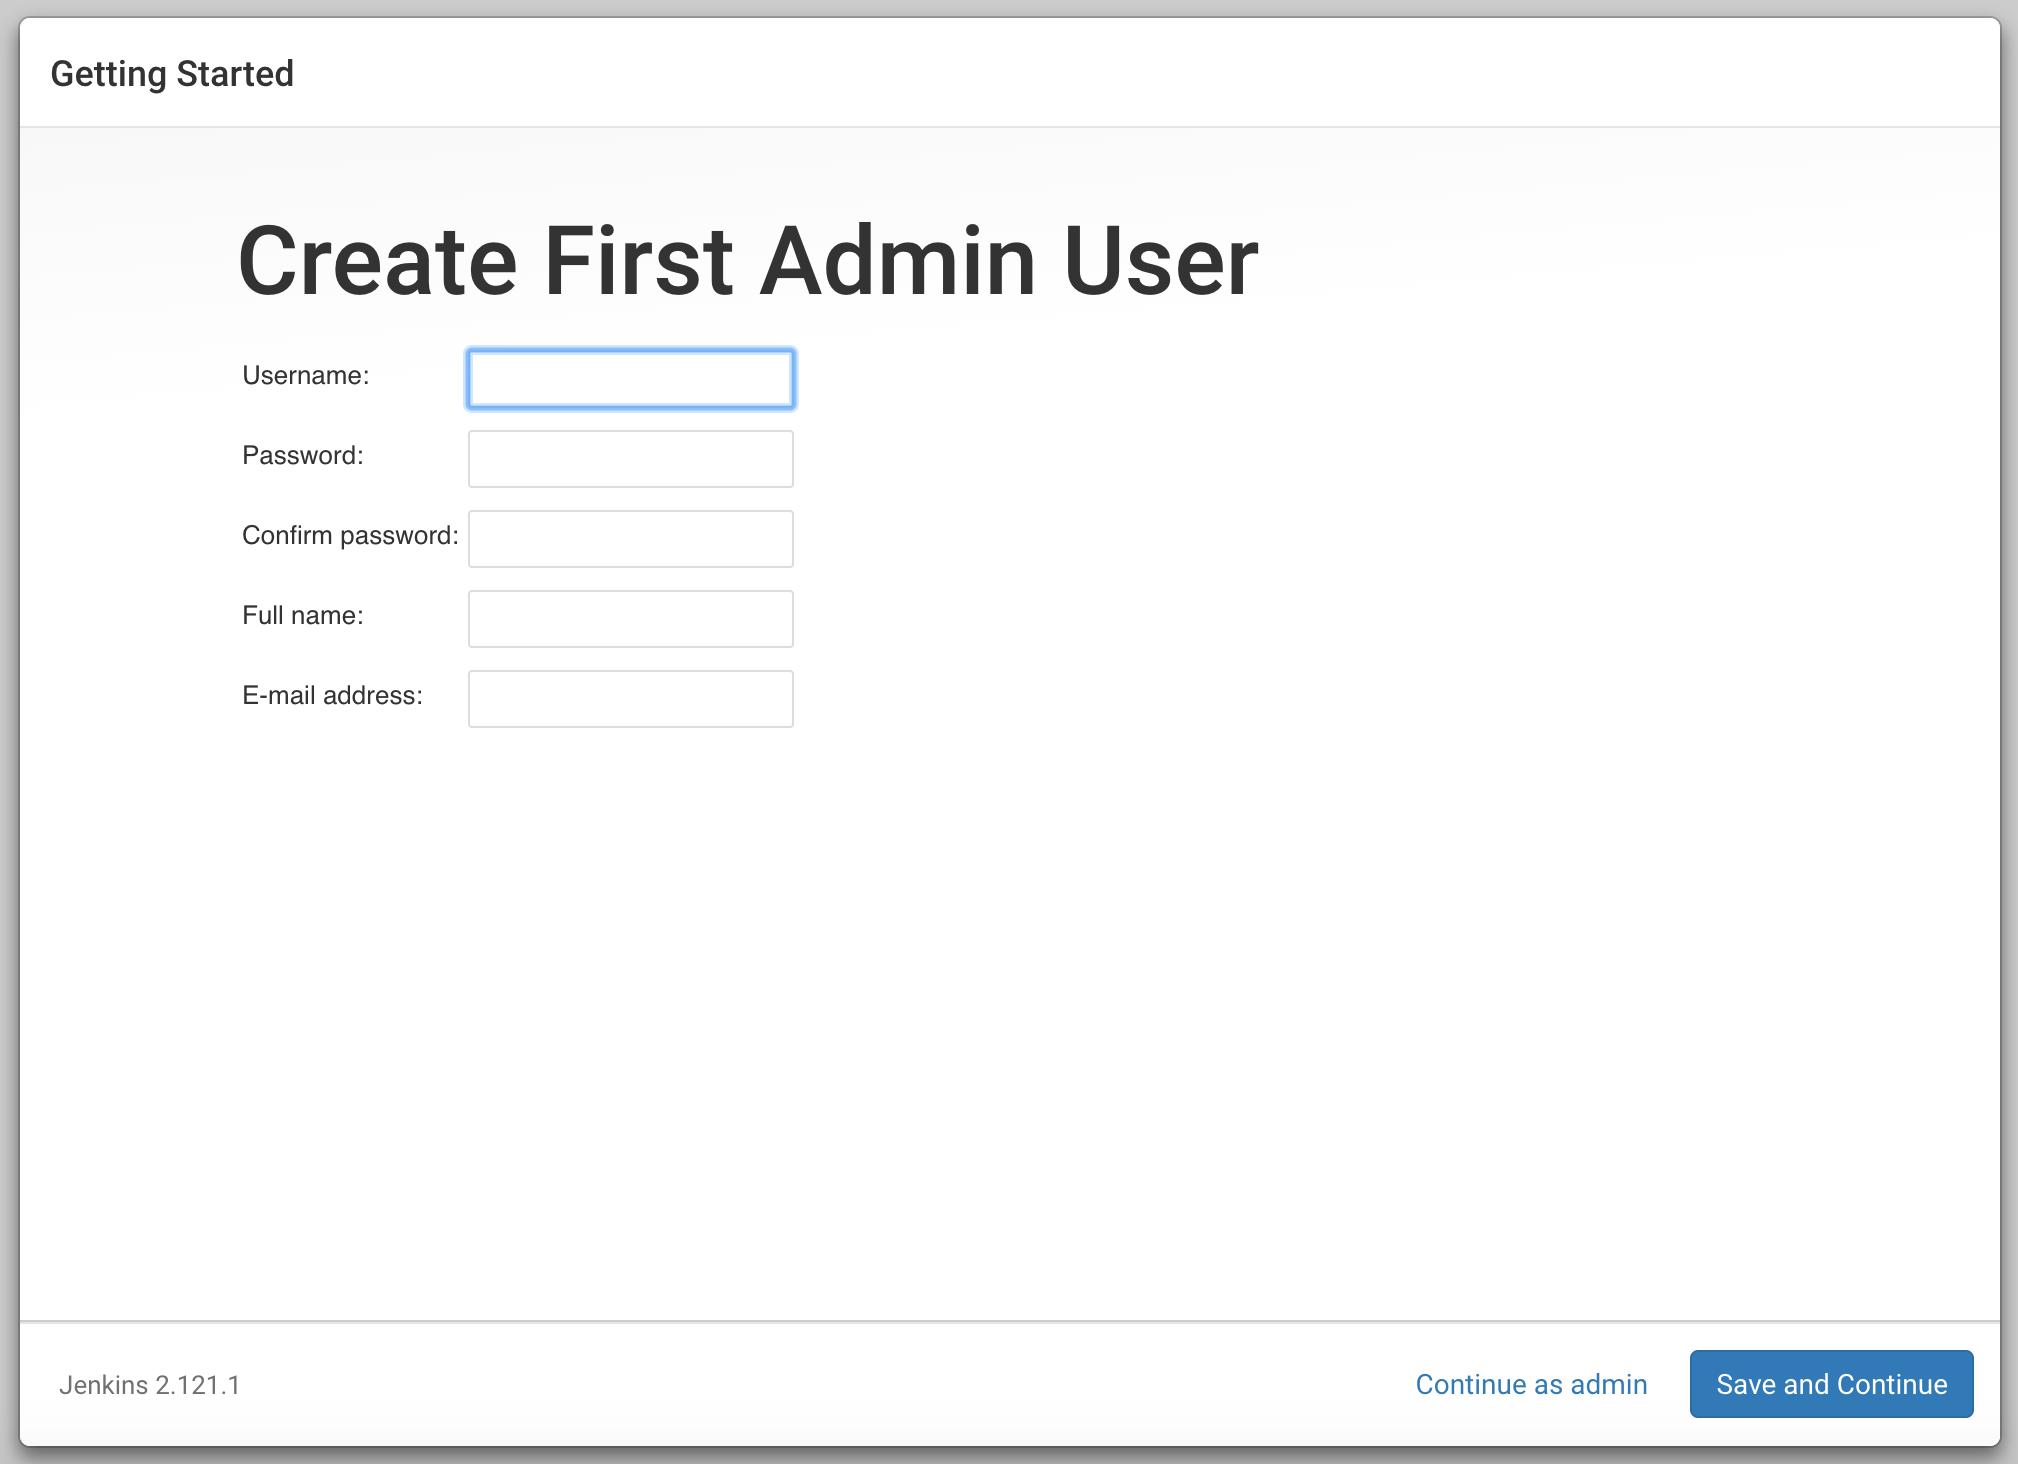 Jenkins Create First Admin User Screen